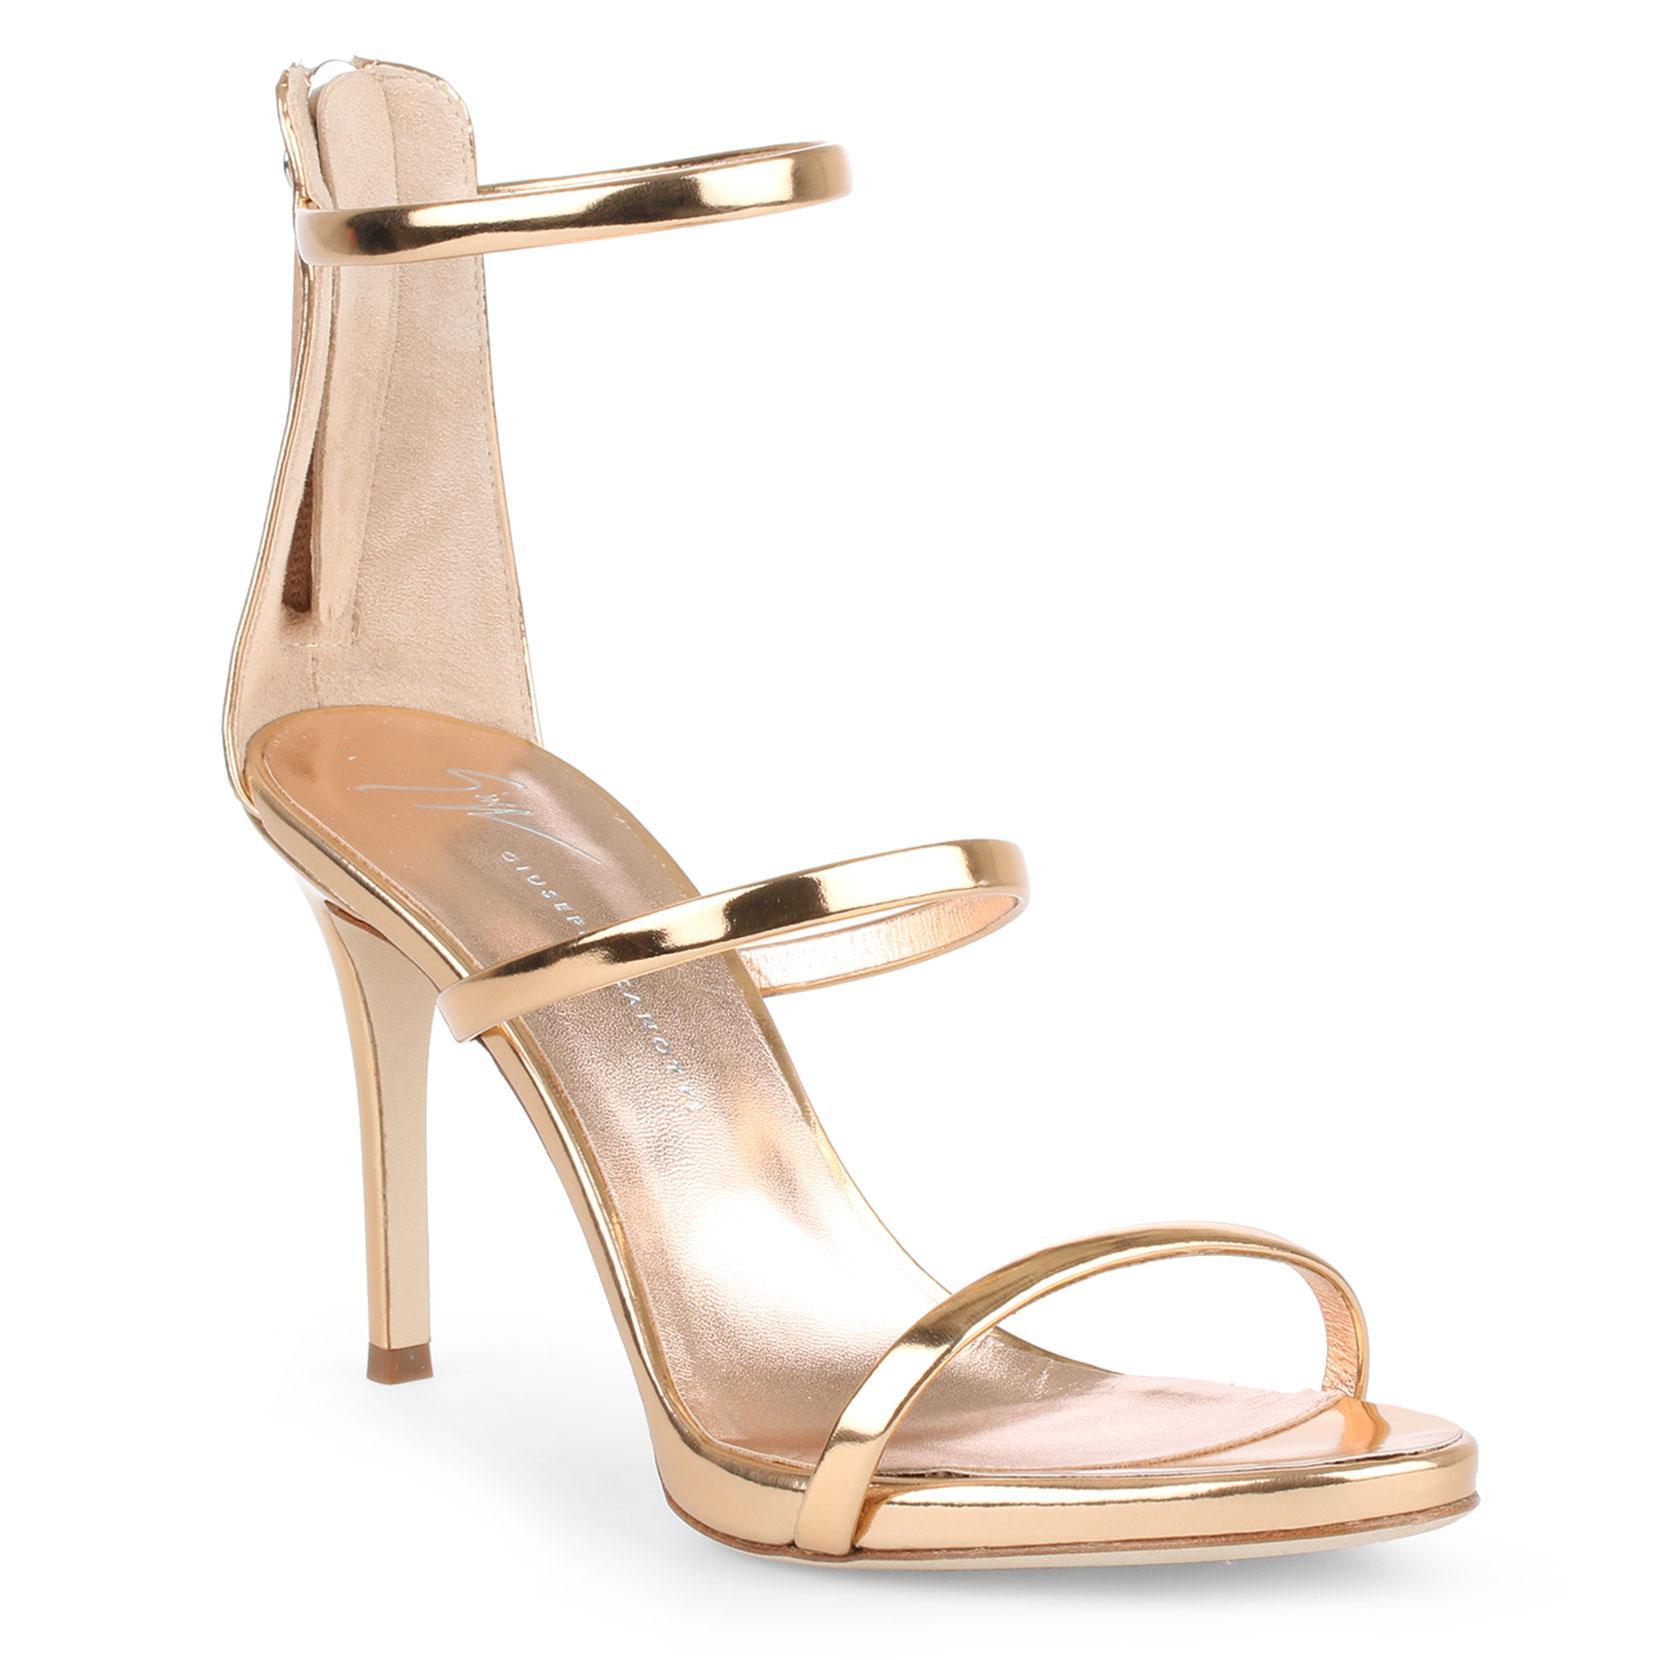 3b7b898d937de Giuseppe Zanotti Harmony 90 Rose Gold Sandals in Metallic - Lyst